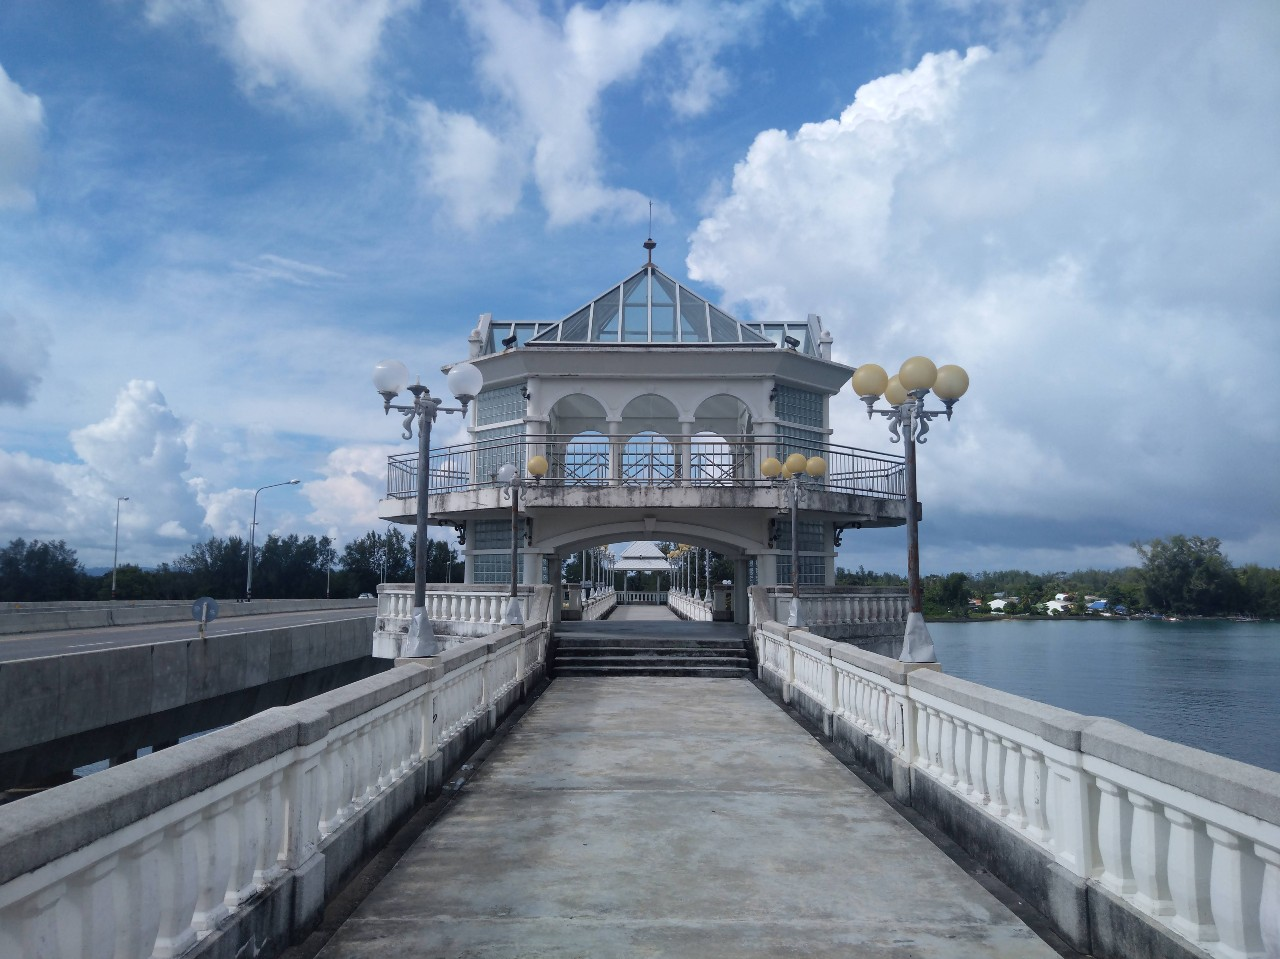 Pavilion on the old Sarasin Bridge of Phuket, Thailand